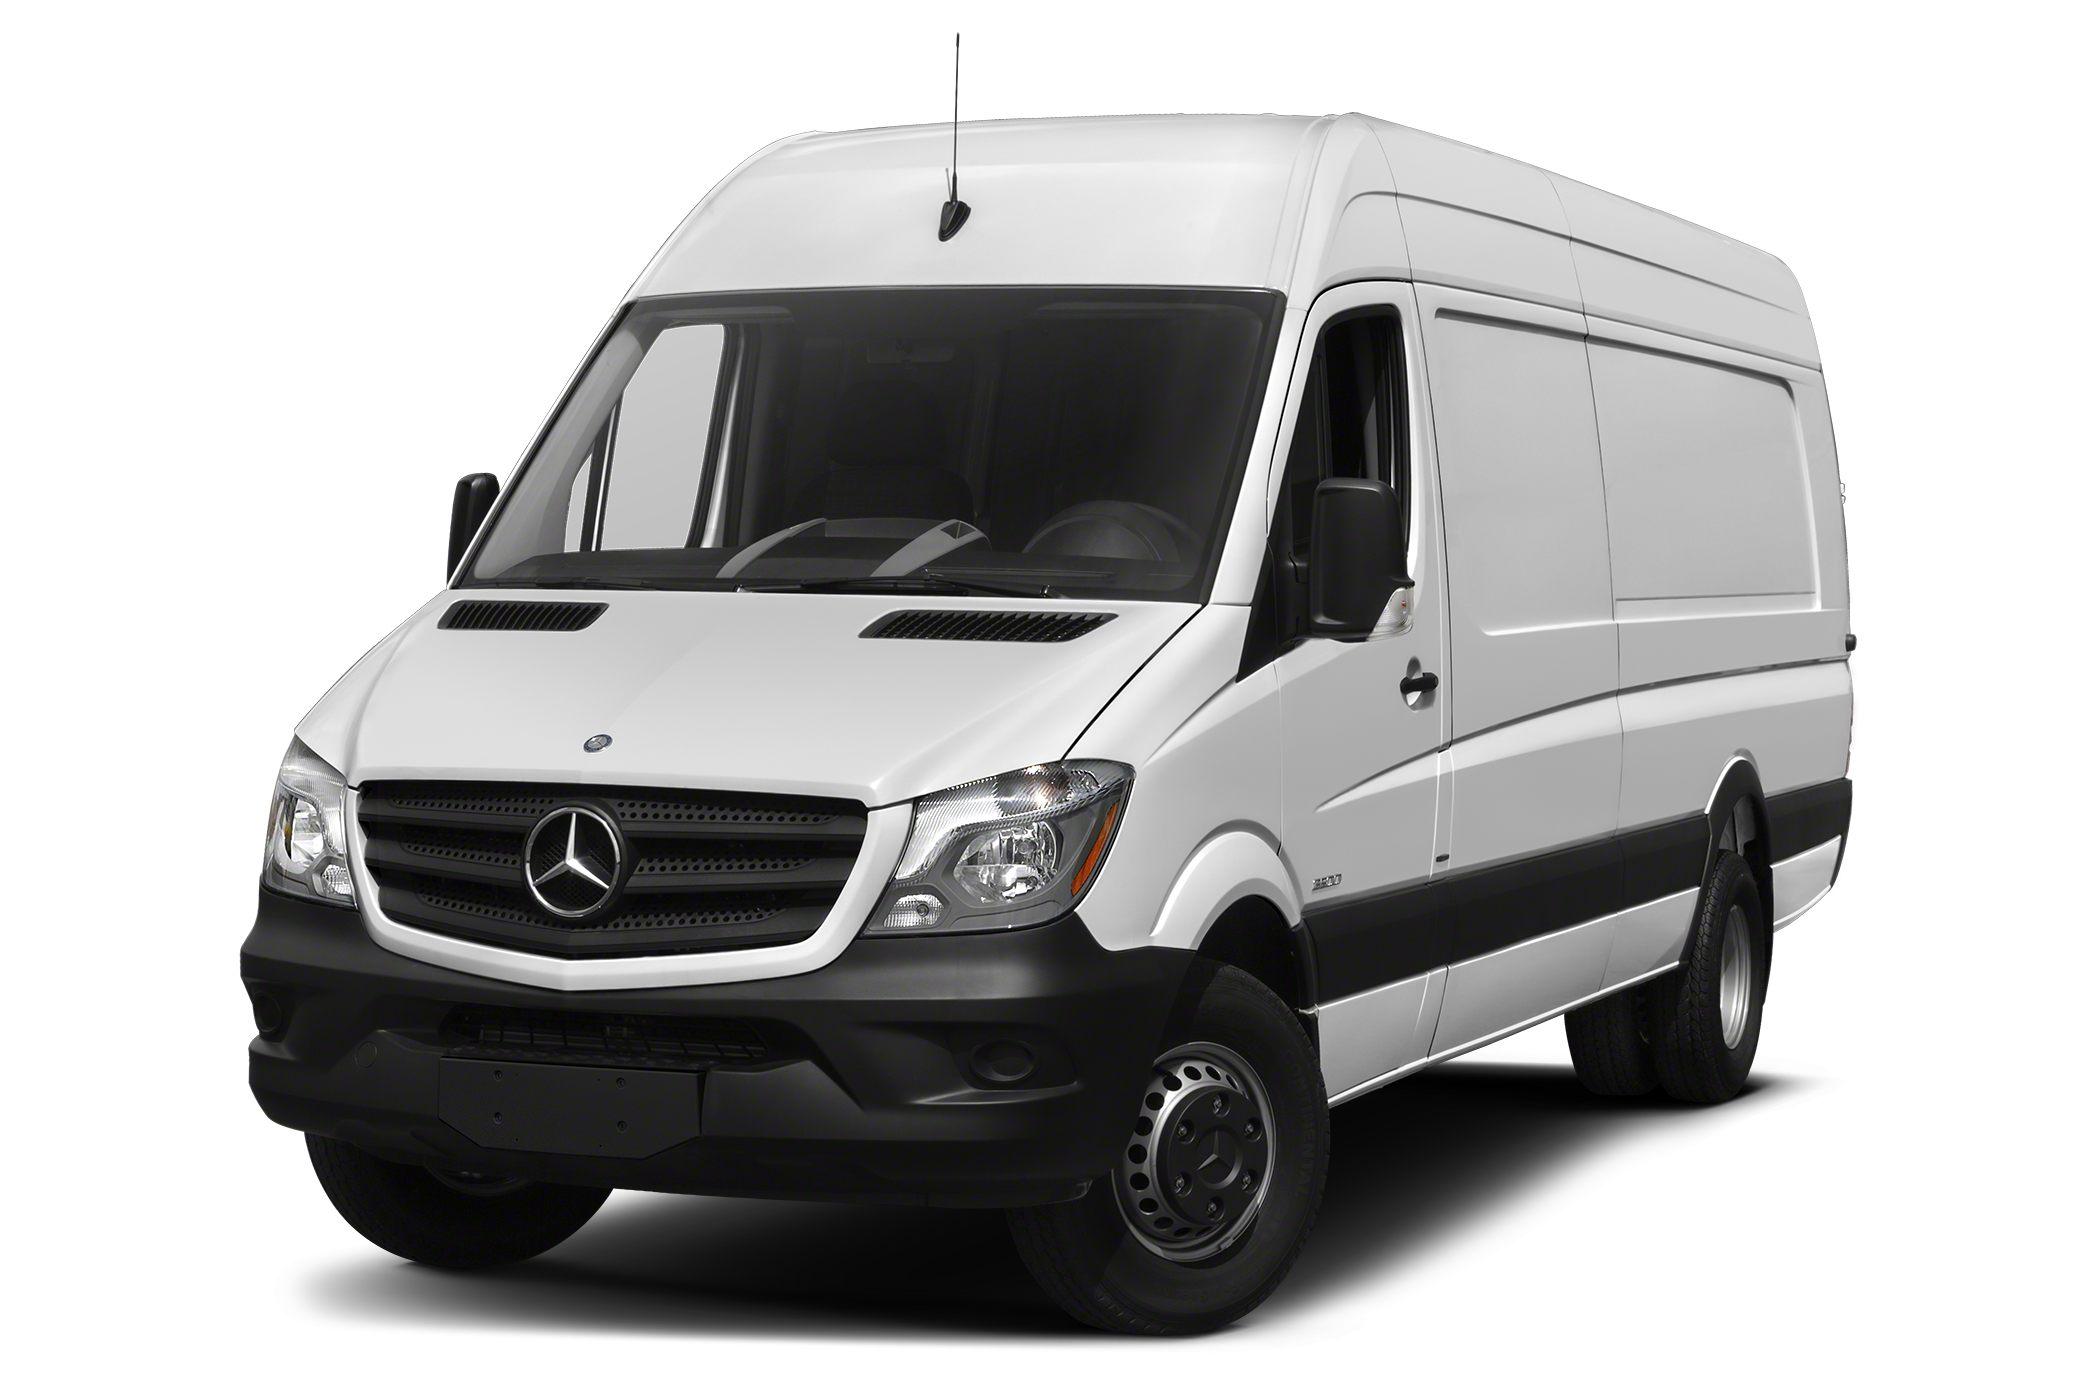 a17b9a9b5b 2015 Mercedes-Benz Sprinter-Class High Roof Sprinter 3500 Cargo Van 144 in.  WB Rear-wheel Drive DRW Specs and Prices